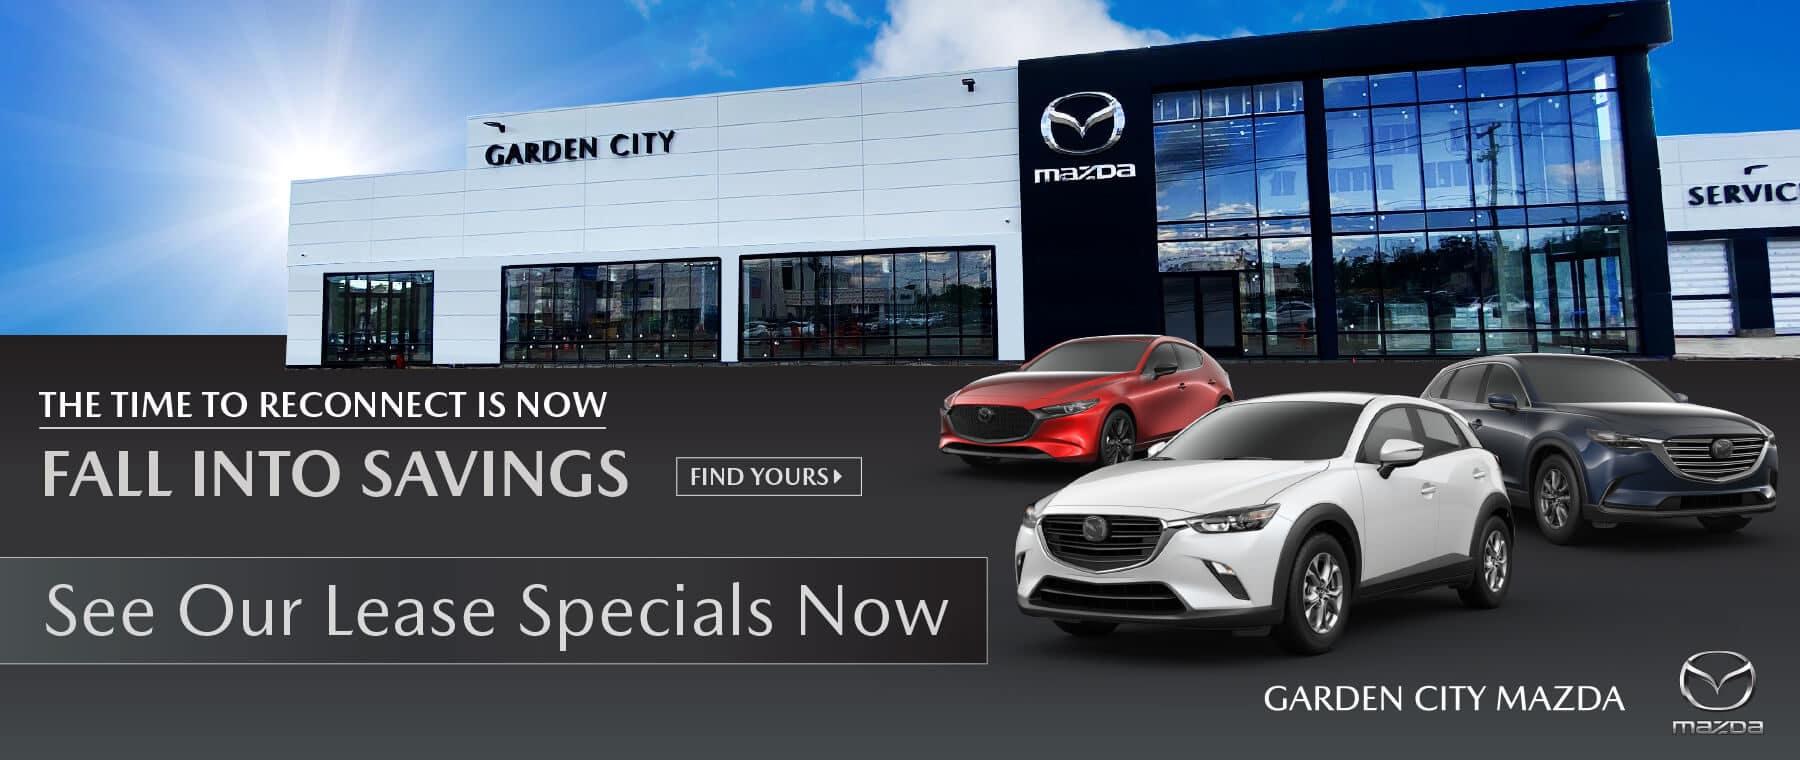 2021.09.23-Garden-City-Mazda-OCT-Web-S54354mr-1